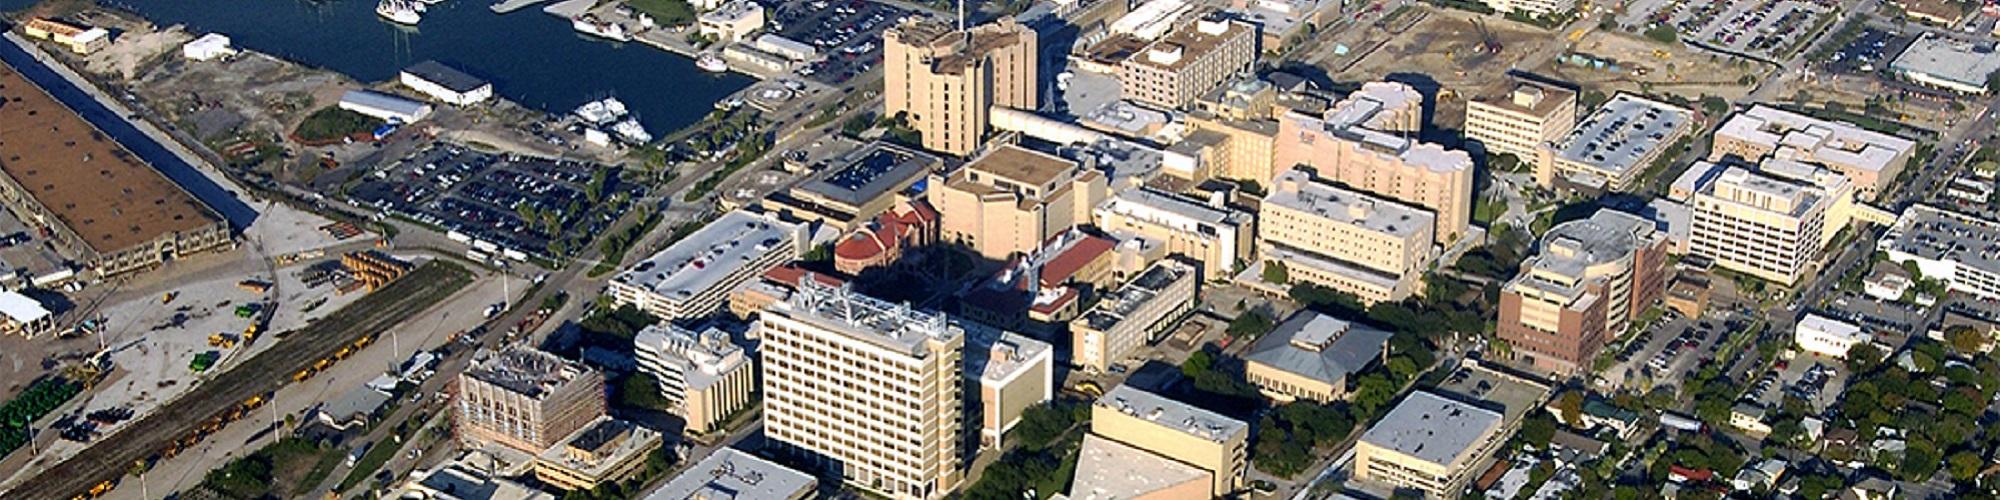 aerial photo of UTMB Galveston